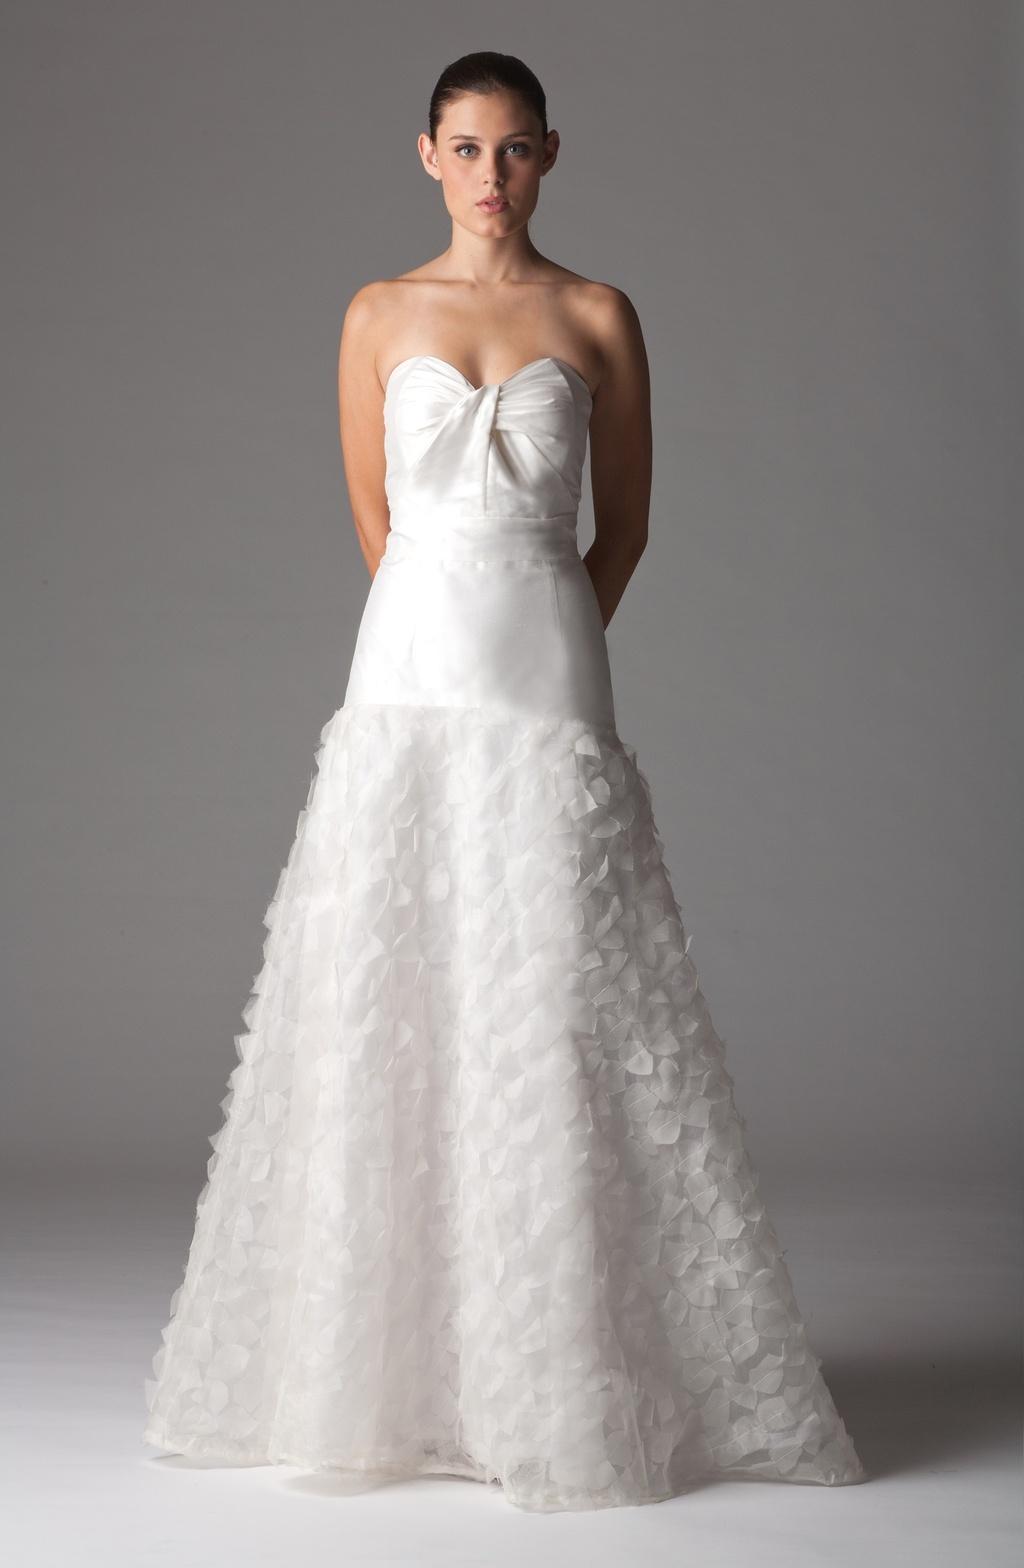 Aria-wedding-dresses-2012-bridal-gowns-embellished-skirt-applique.full